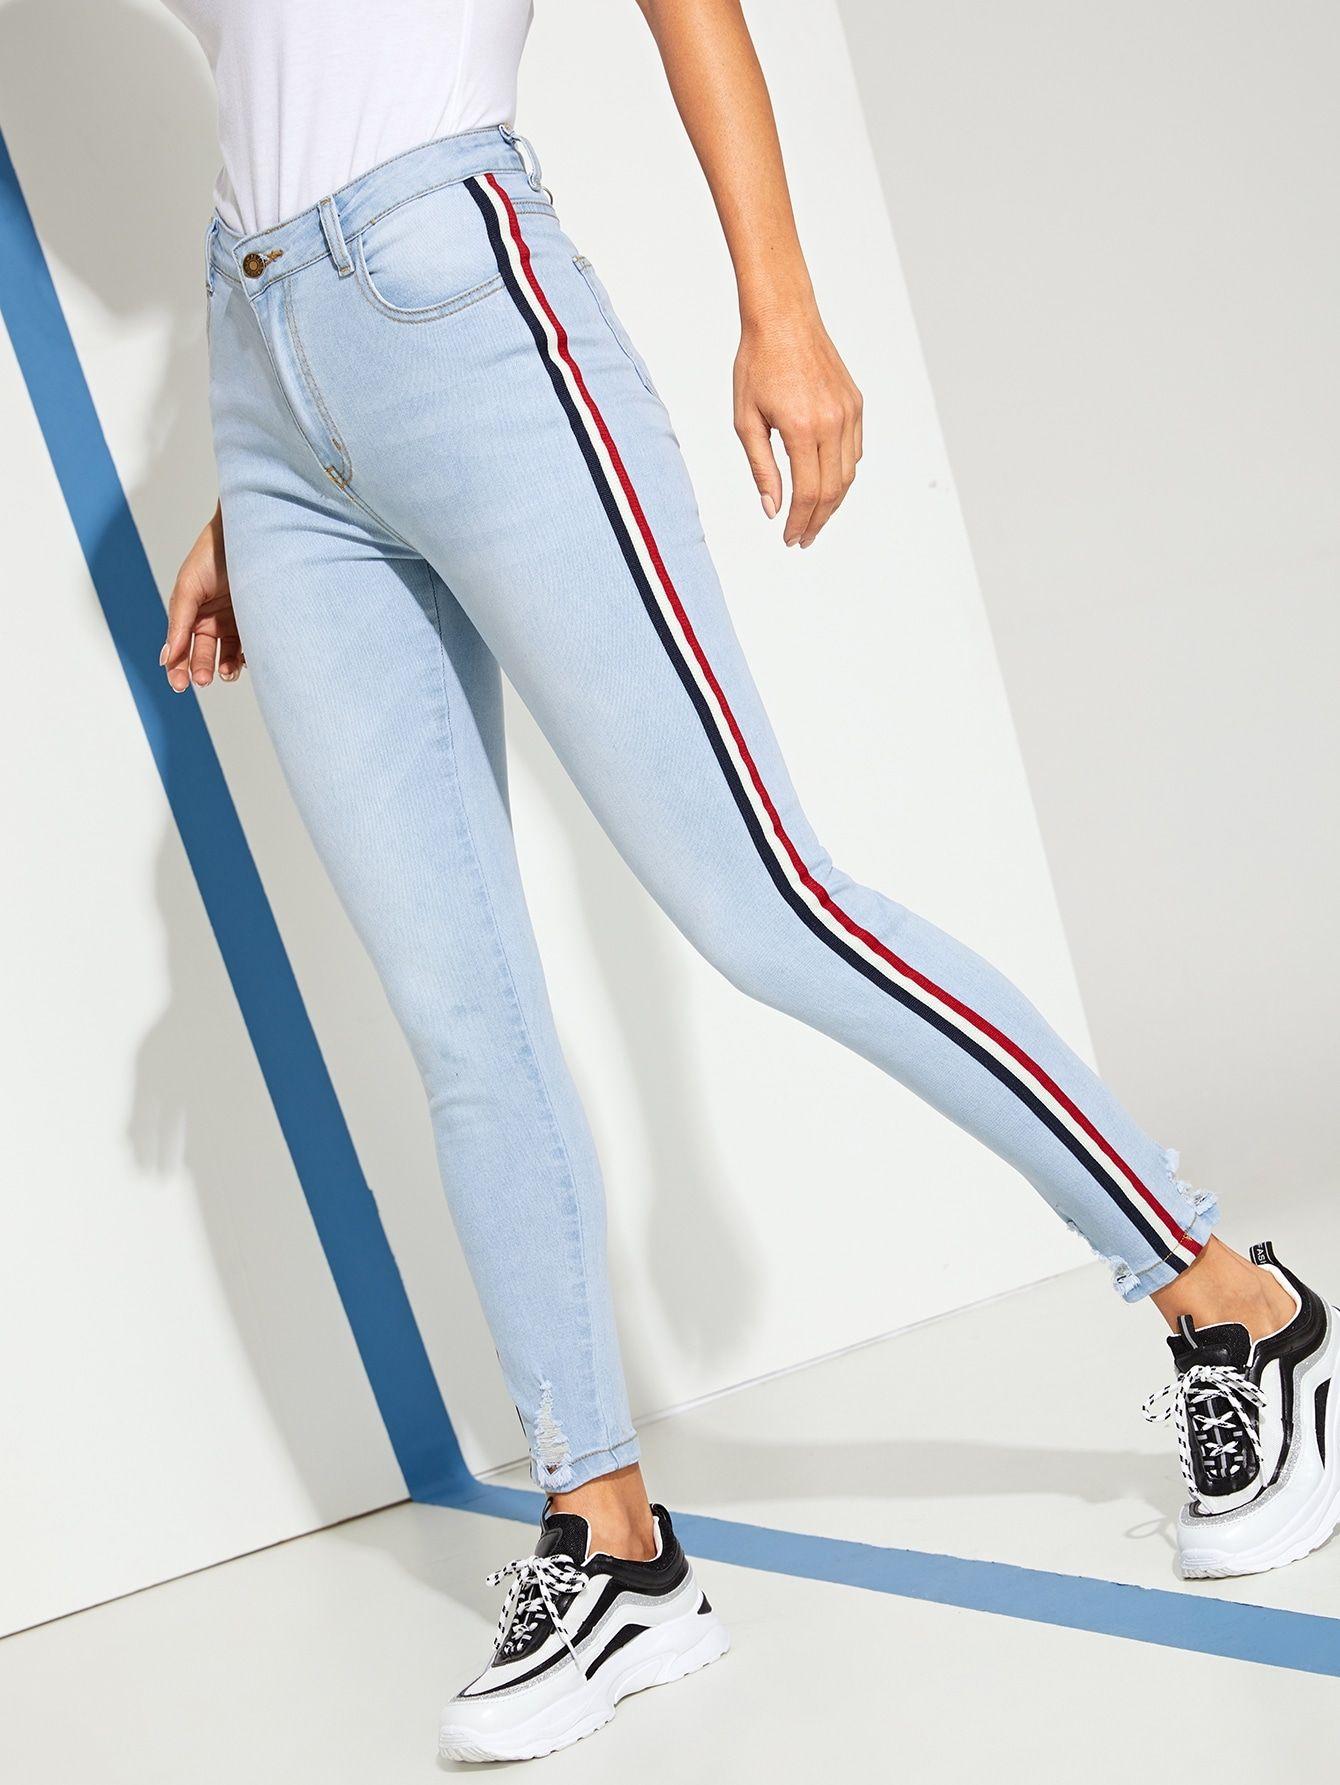 Ripped Tuxedo Stripe Side Skinny Jeans Ad Stripe Tuxedo Ripped Pantalones De Moda Ropa Adidas Jeans De Moda